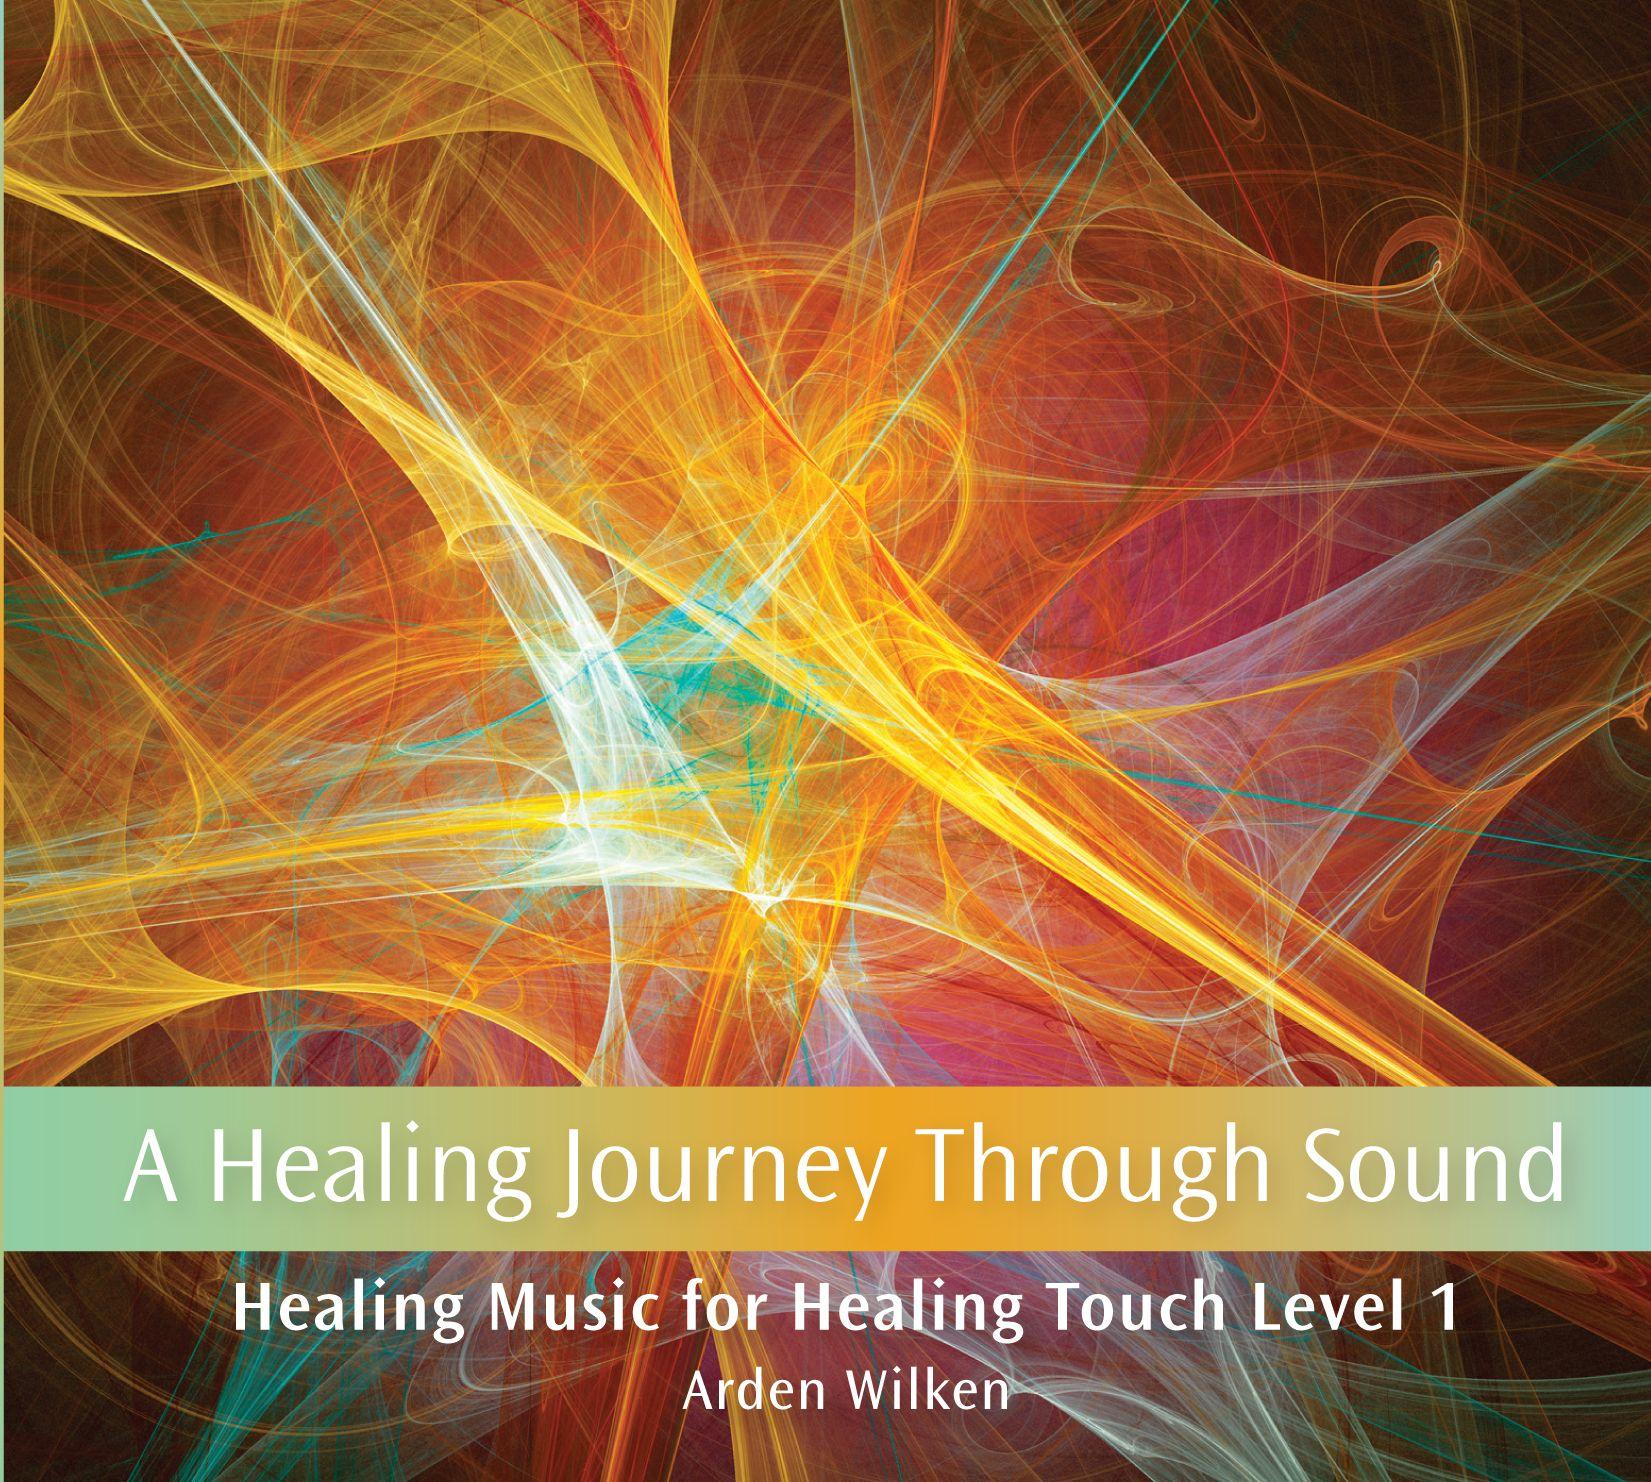 Shopping Cart Software Ecommerce Software Solutions By Cs Cart Healing Touch Healing Journey Sound Healing